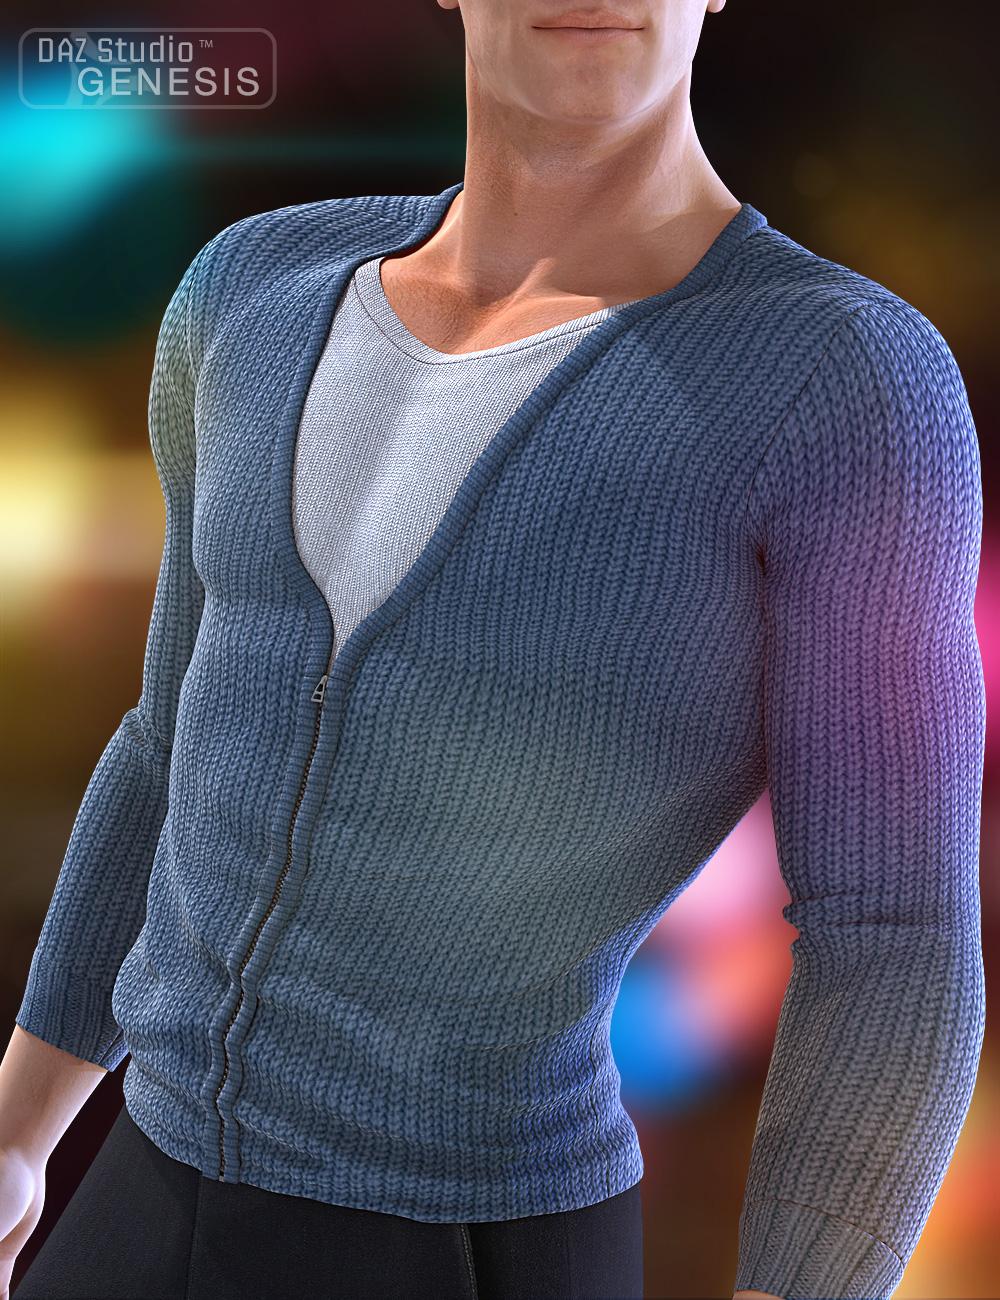 Real Feel Zipped Cardigan by: 4blueyes, 3D Models by Daz 3D